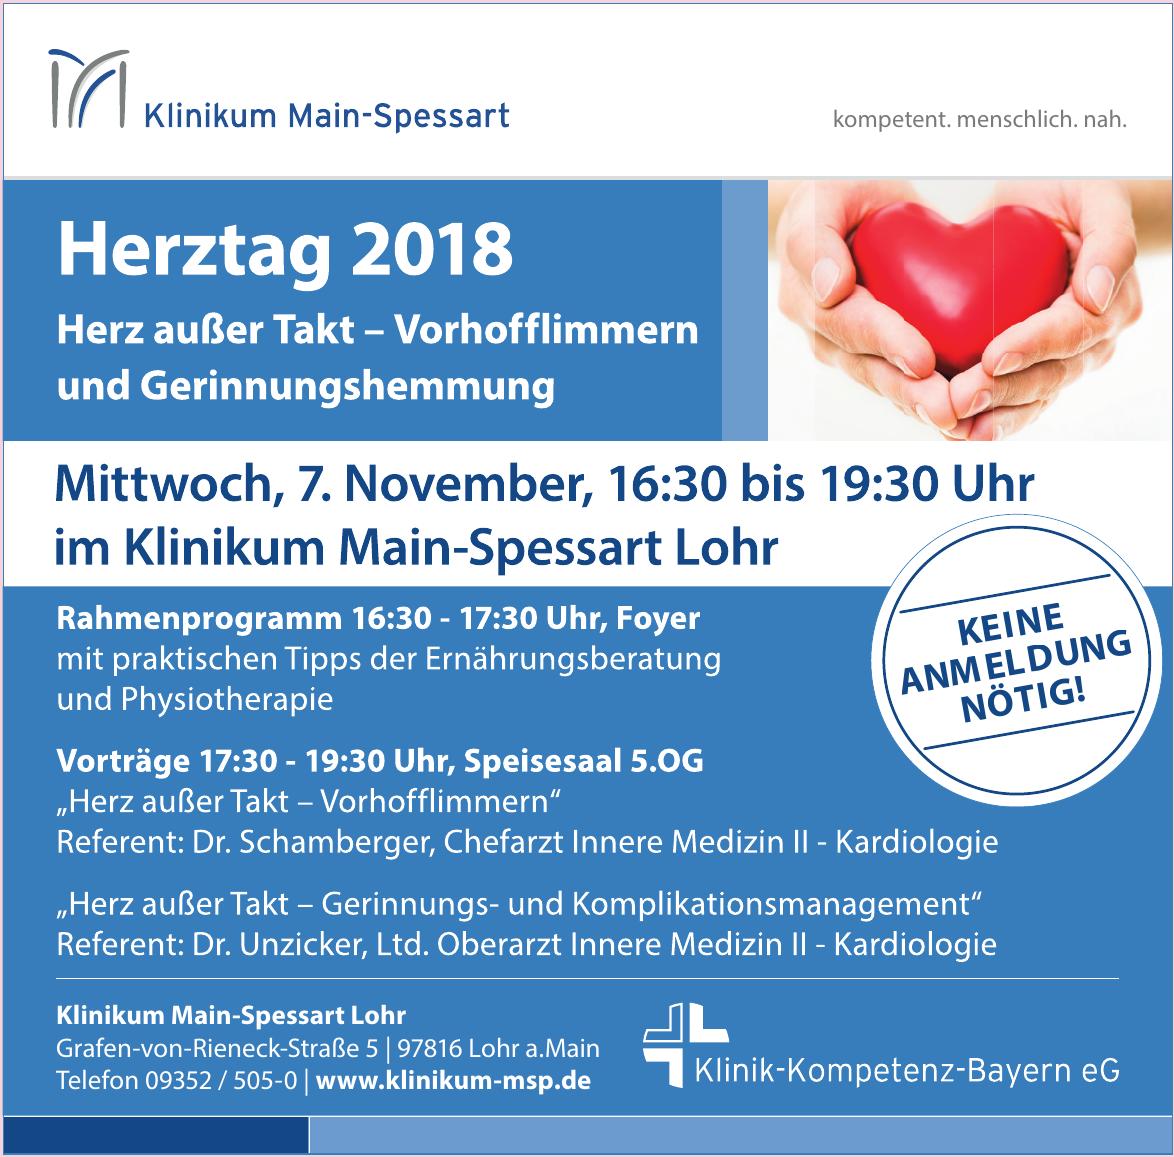 Klinikum Main-Spessart Lohr